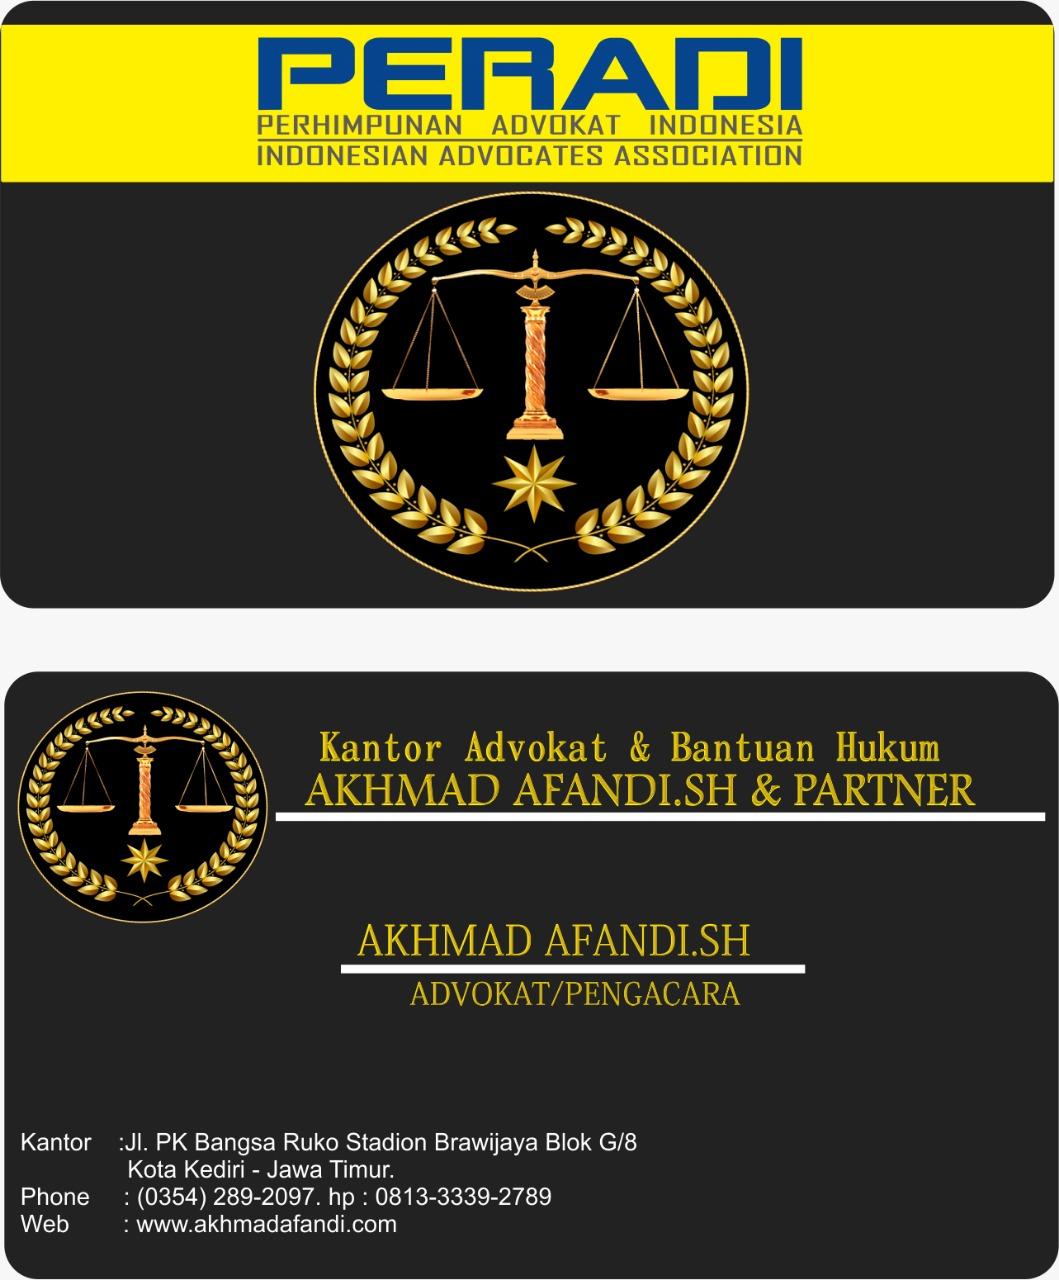 Kantor Advokat & Bantuan Hukum